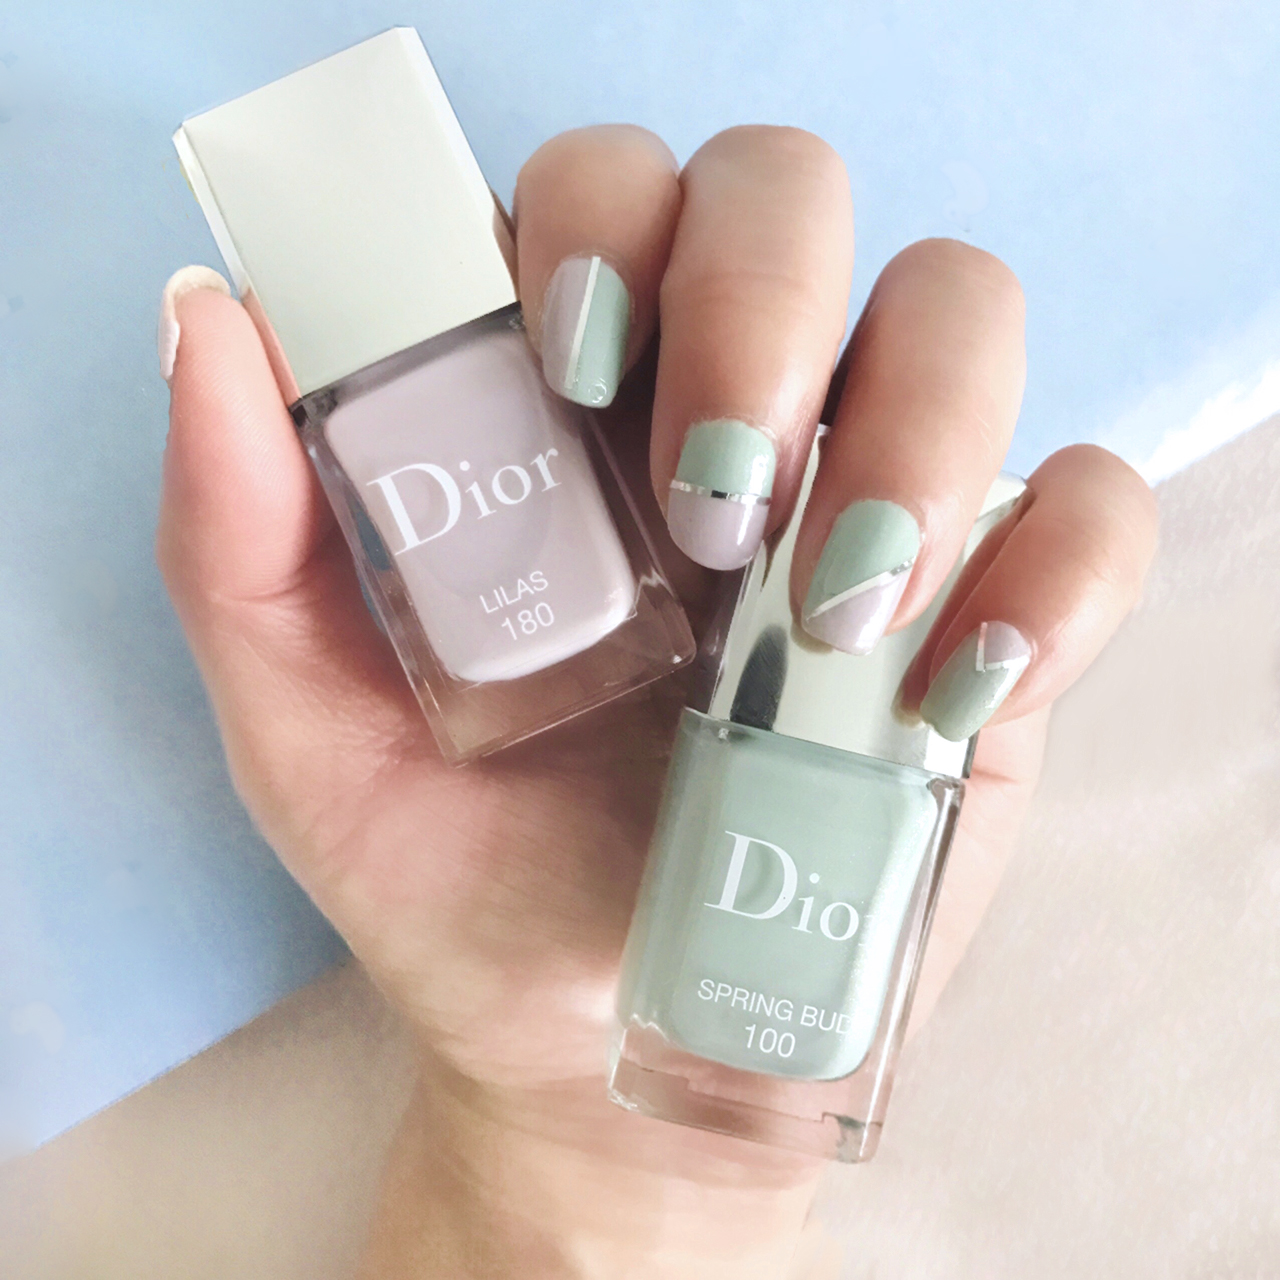 Dior Le Vernis Lilas nail swatch